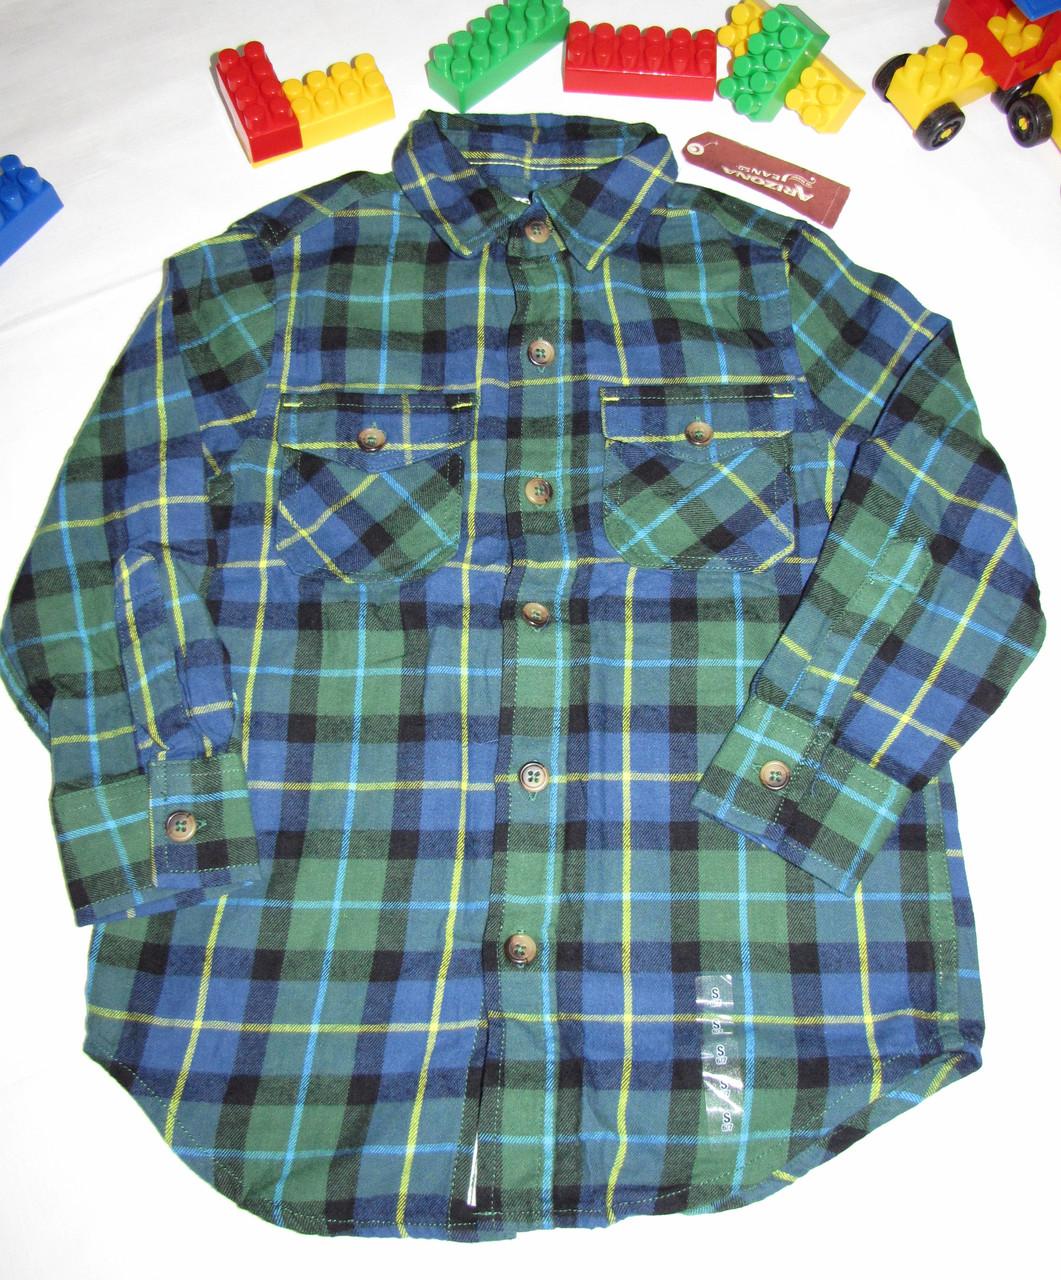 Рубашка  Arizona Jeans оригинал рост 116 см синяя+зеленая 07052